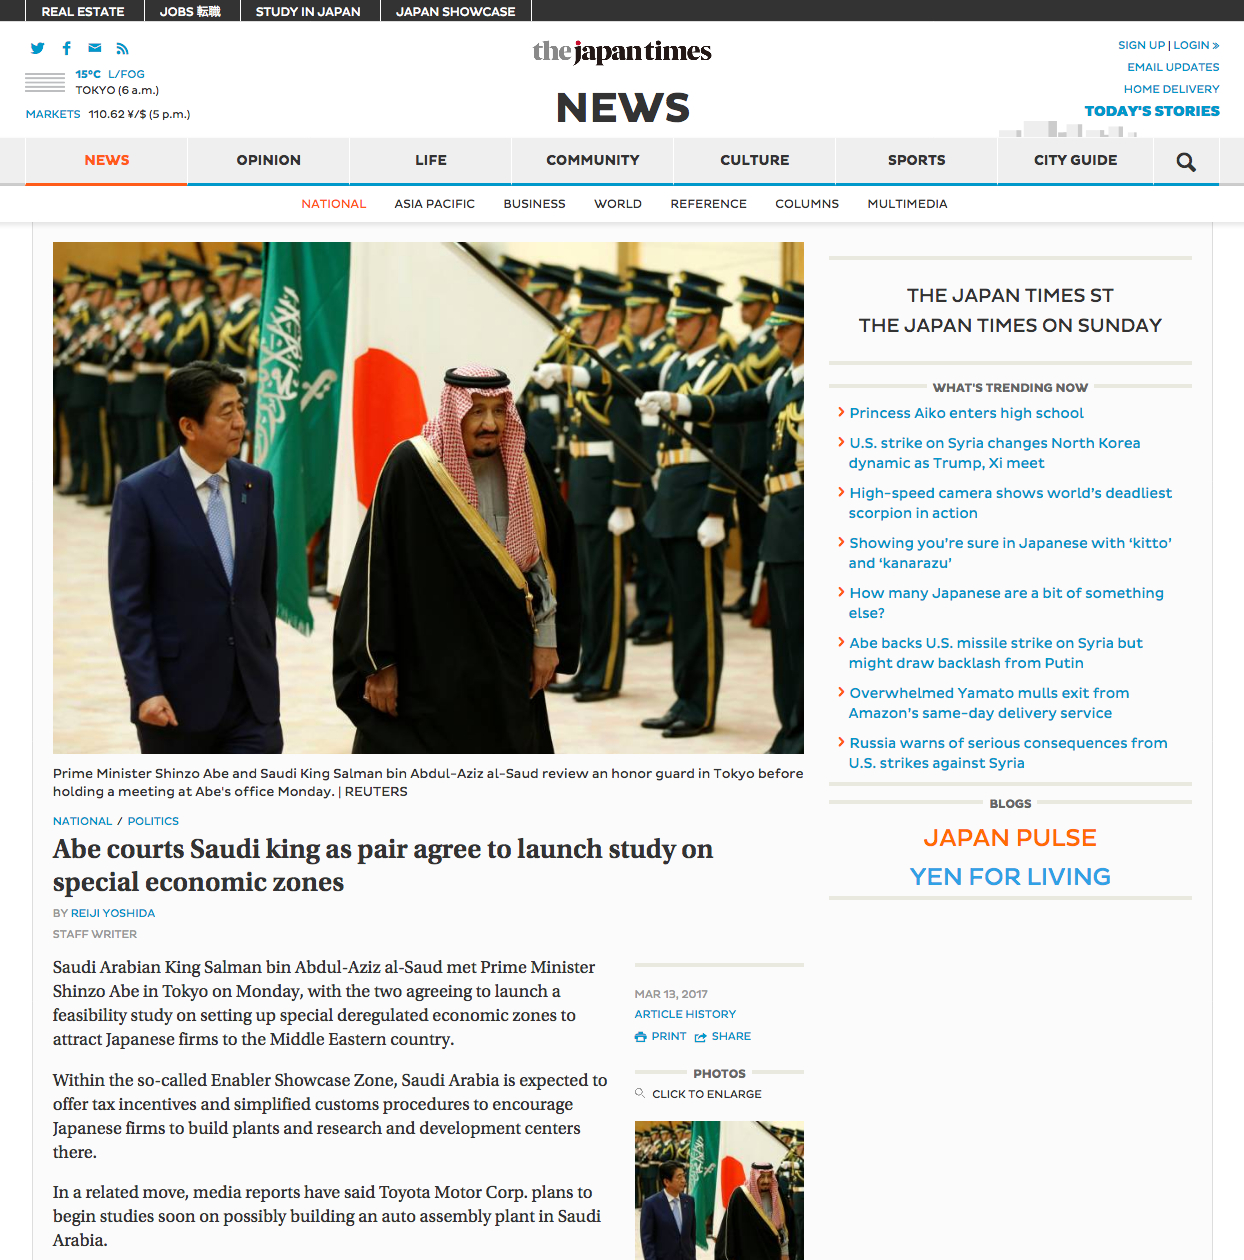 Japan PM Abe Courts Saudi King In Historic Meeting